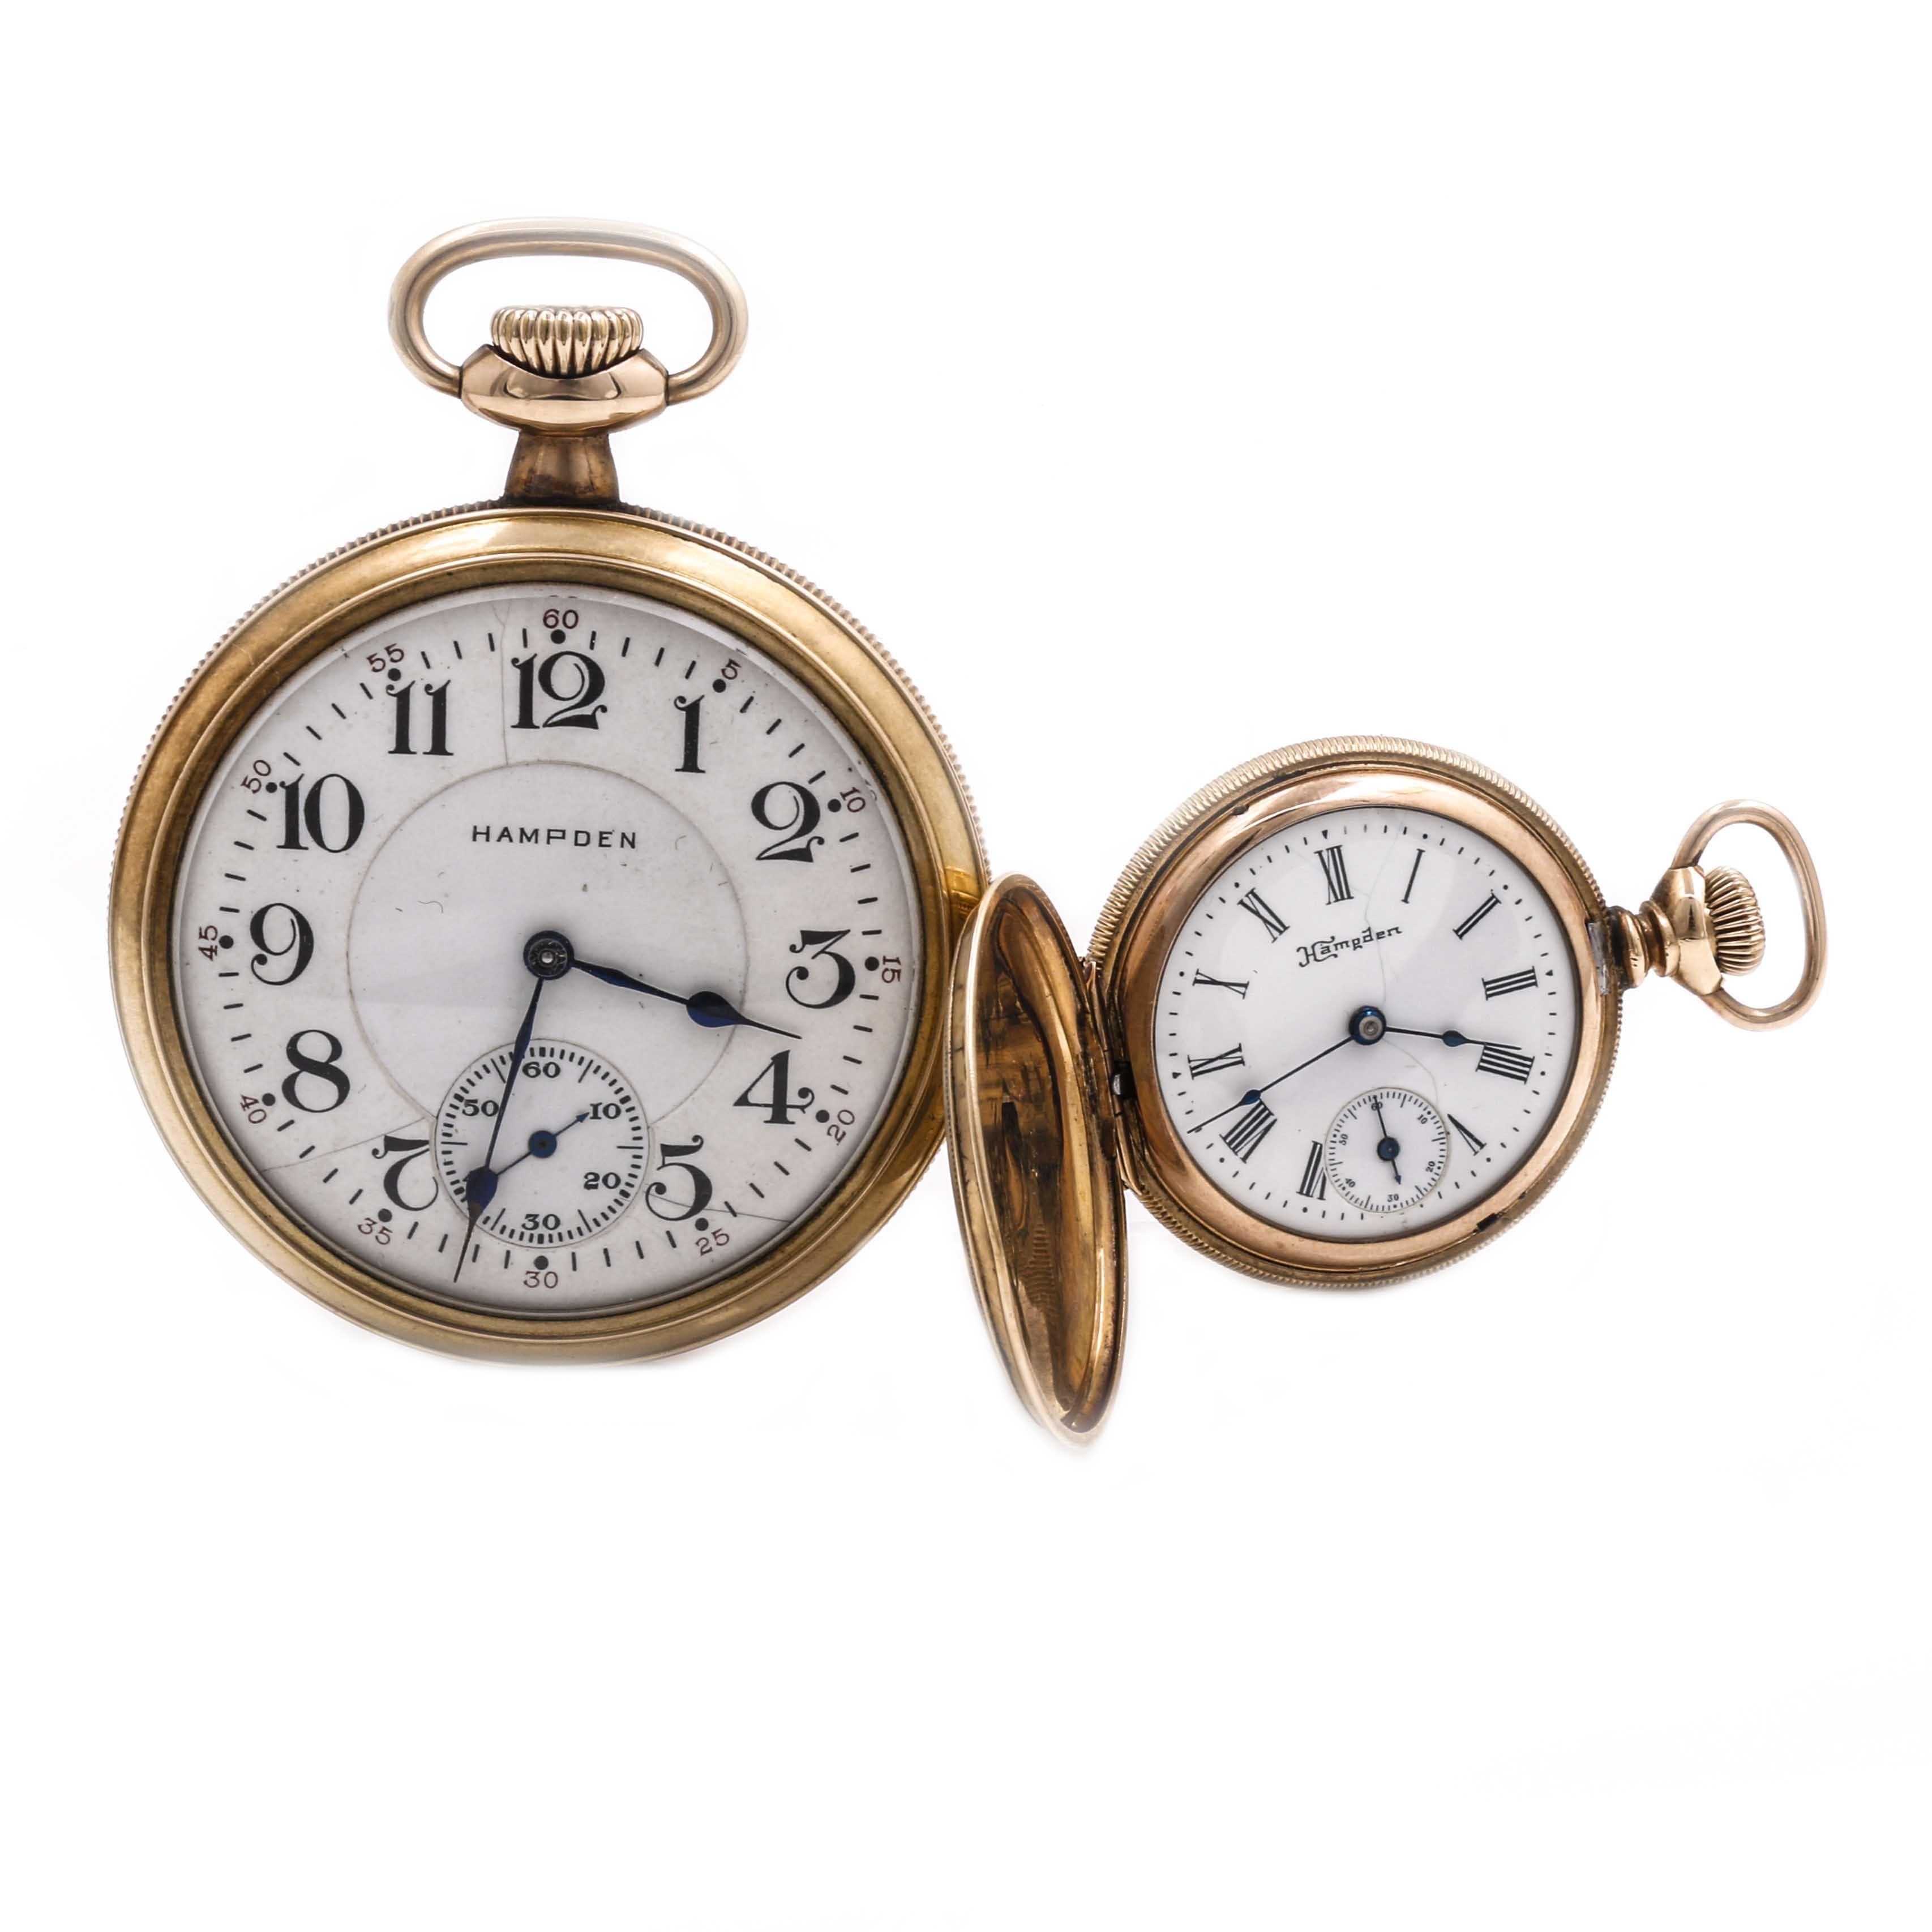 Antique Gold Filled Hampden Pocket Watches